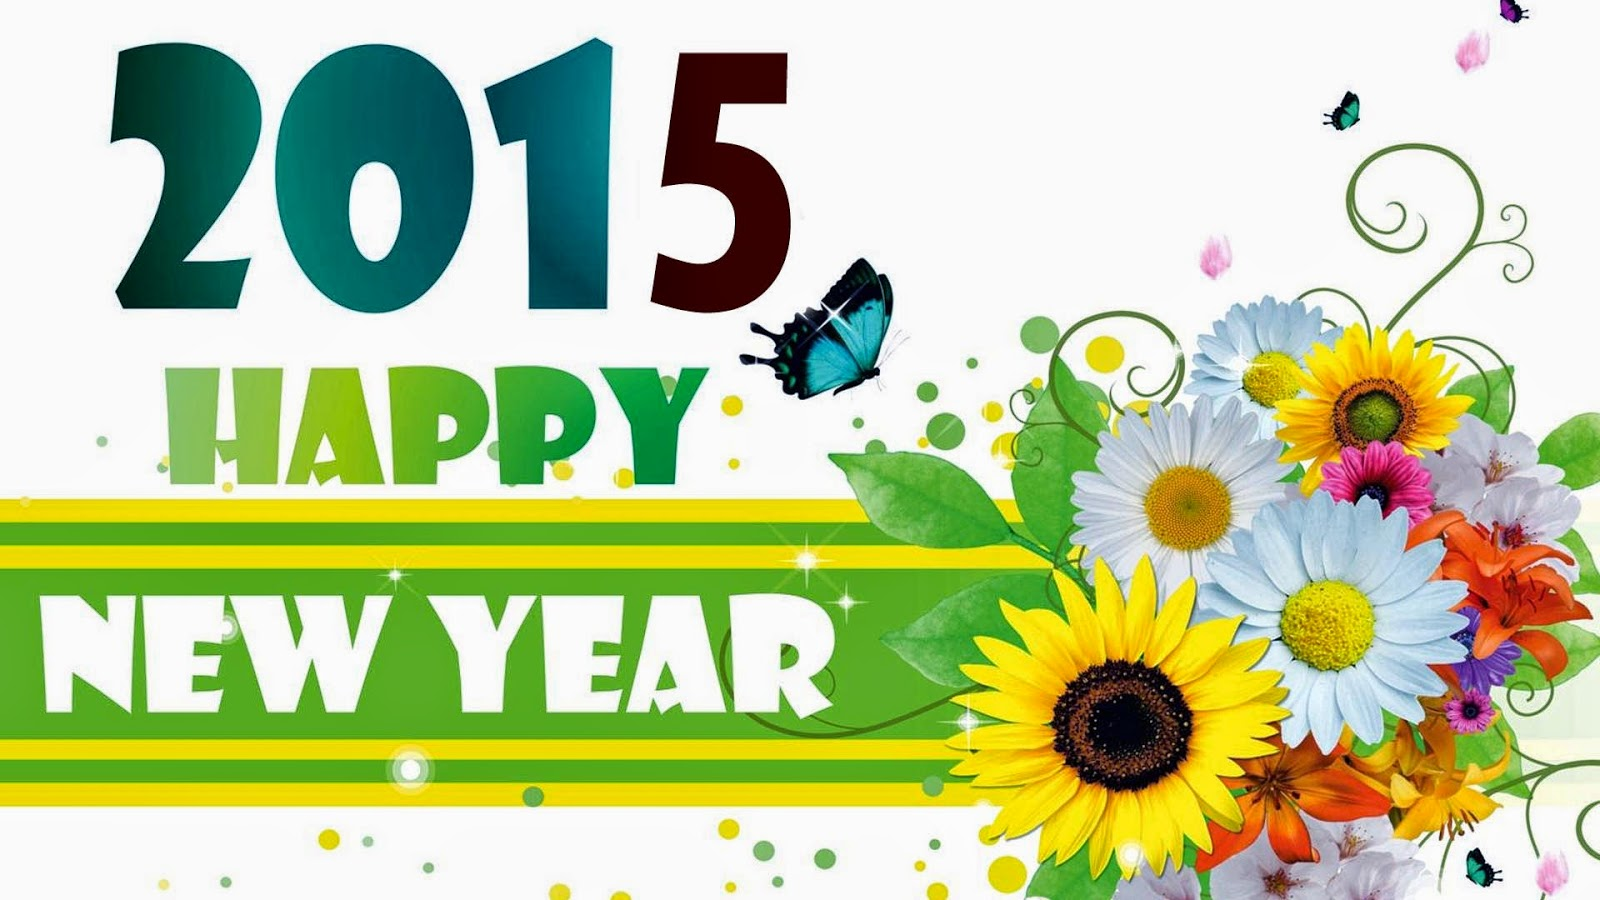 November 2014 happy new year 2015 greetings wishes wallpaper kristyandbryce Gallery